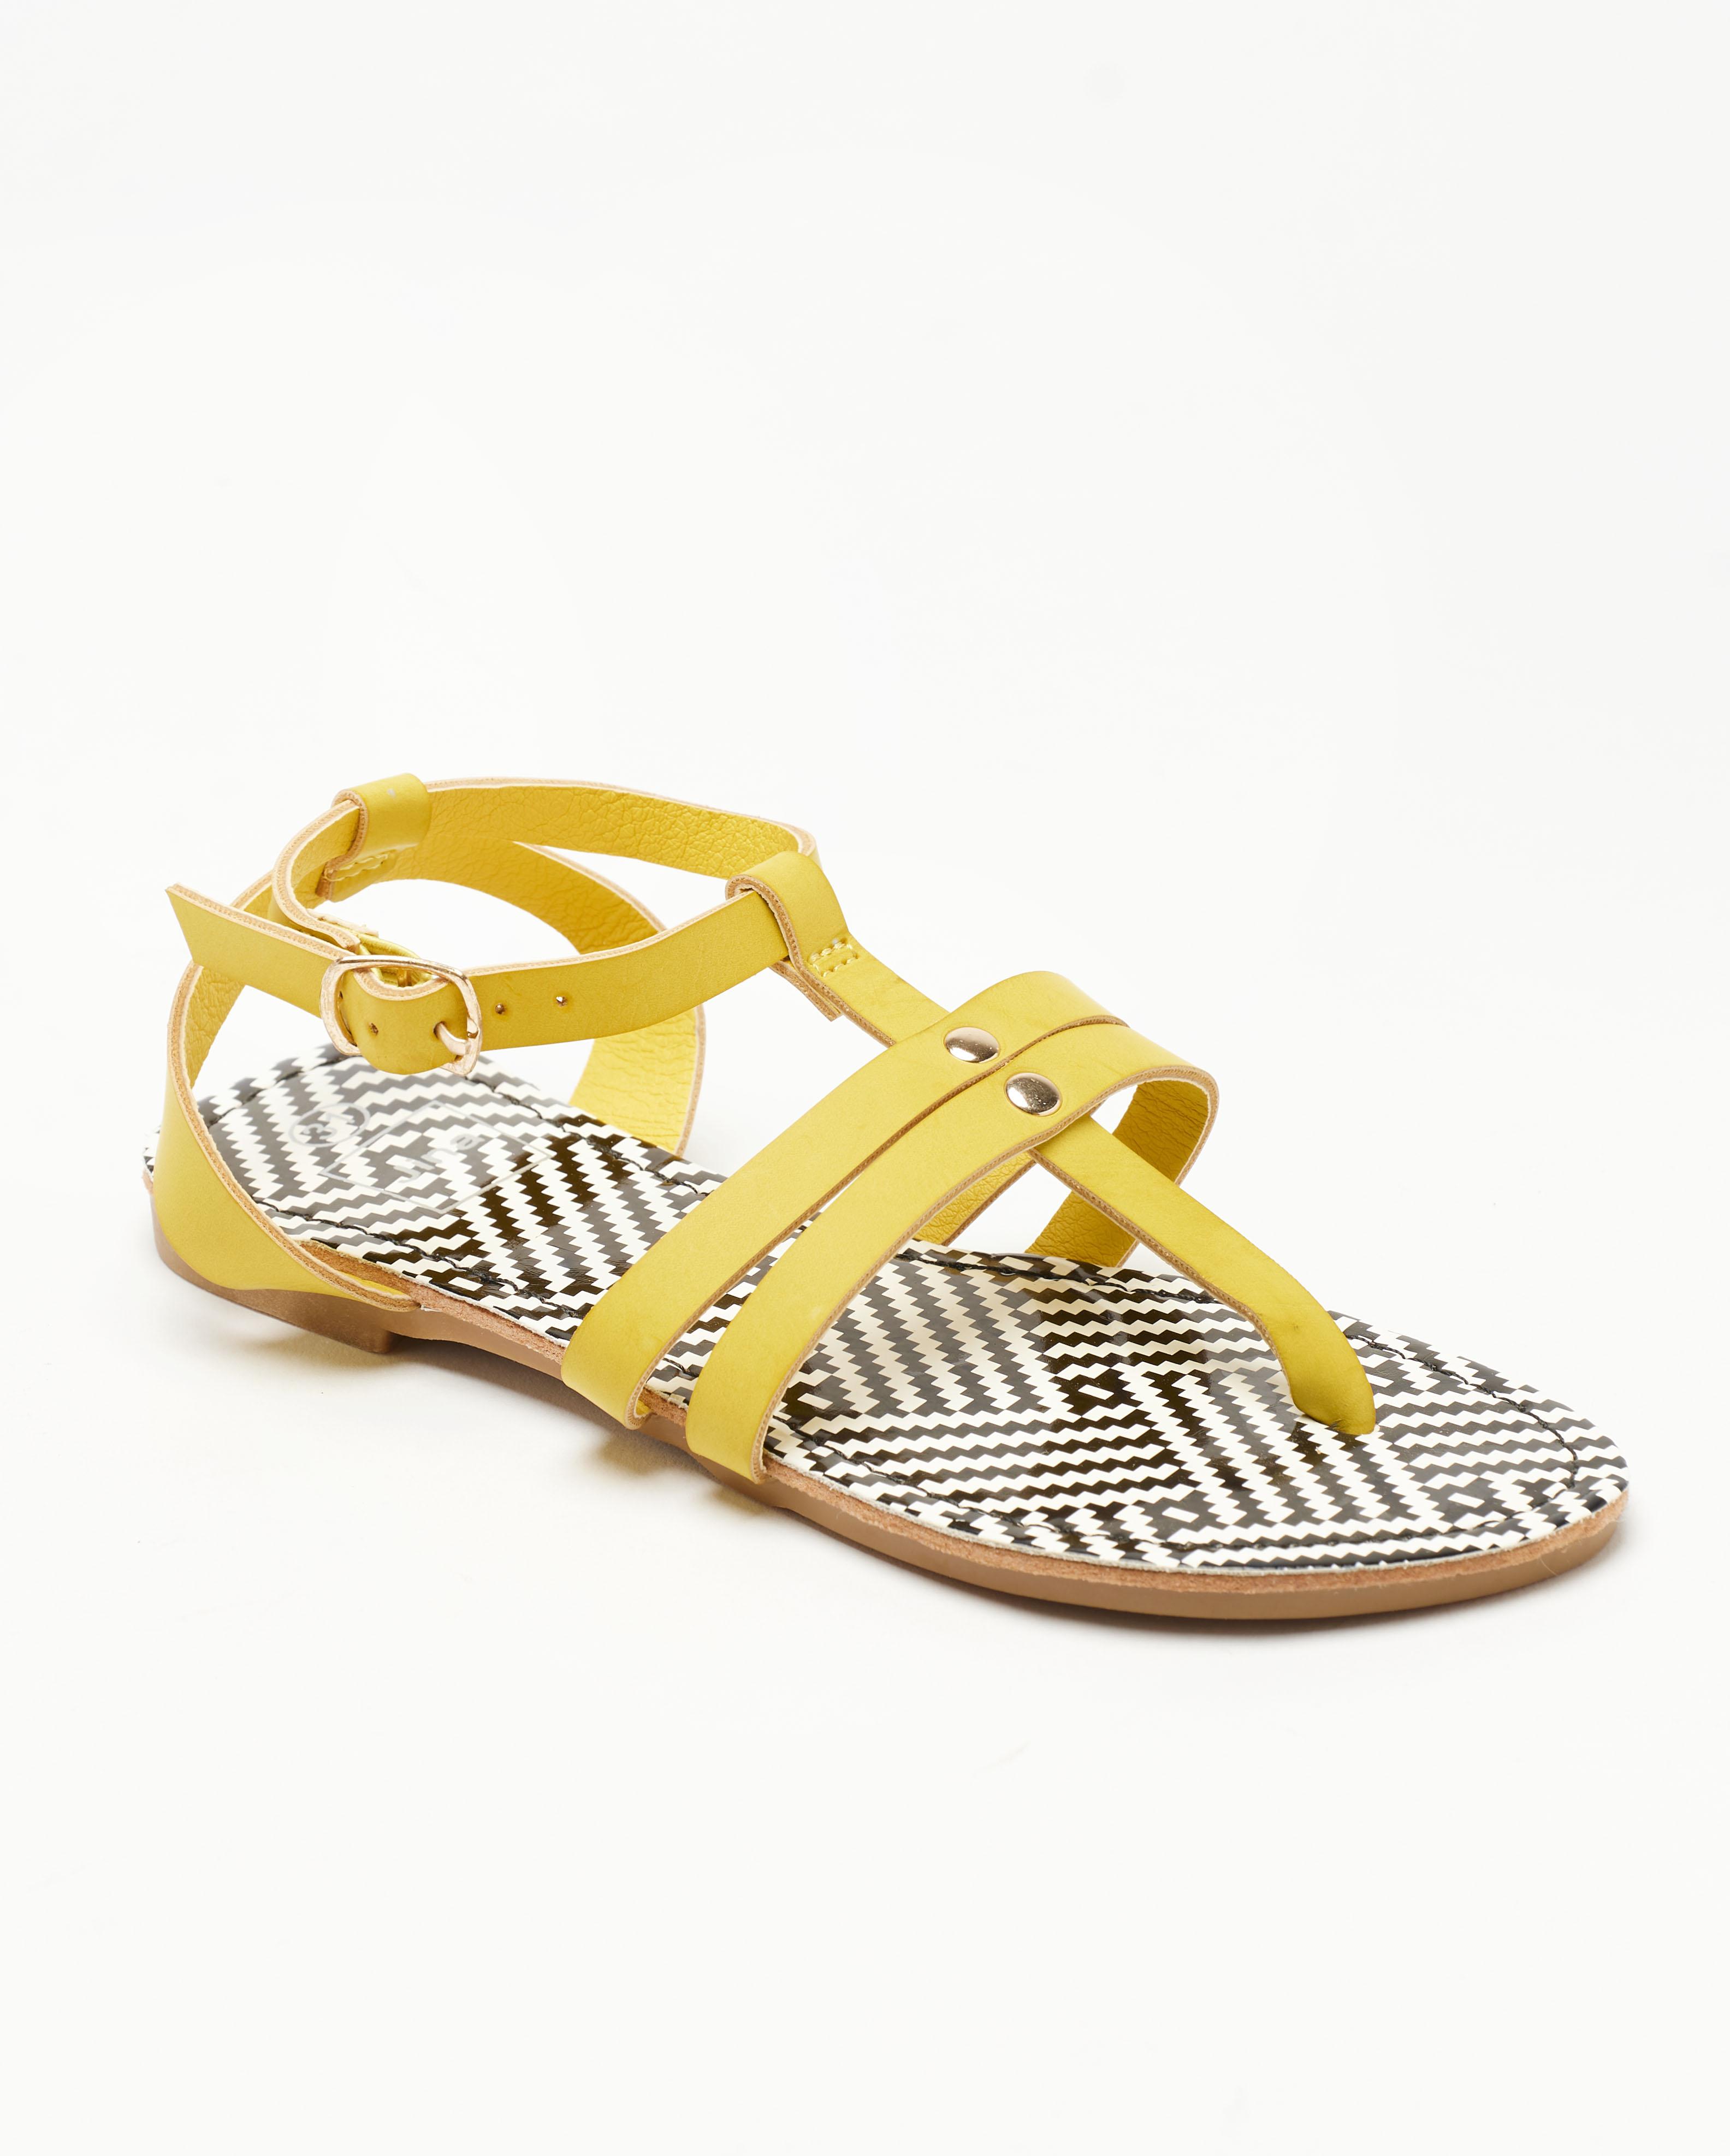 Sandales Fille - Sandale Ouverte Jaune Jina - Sapl Zh4